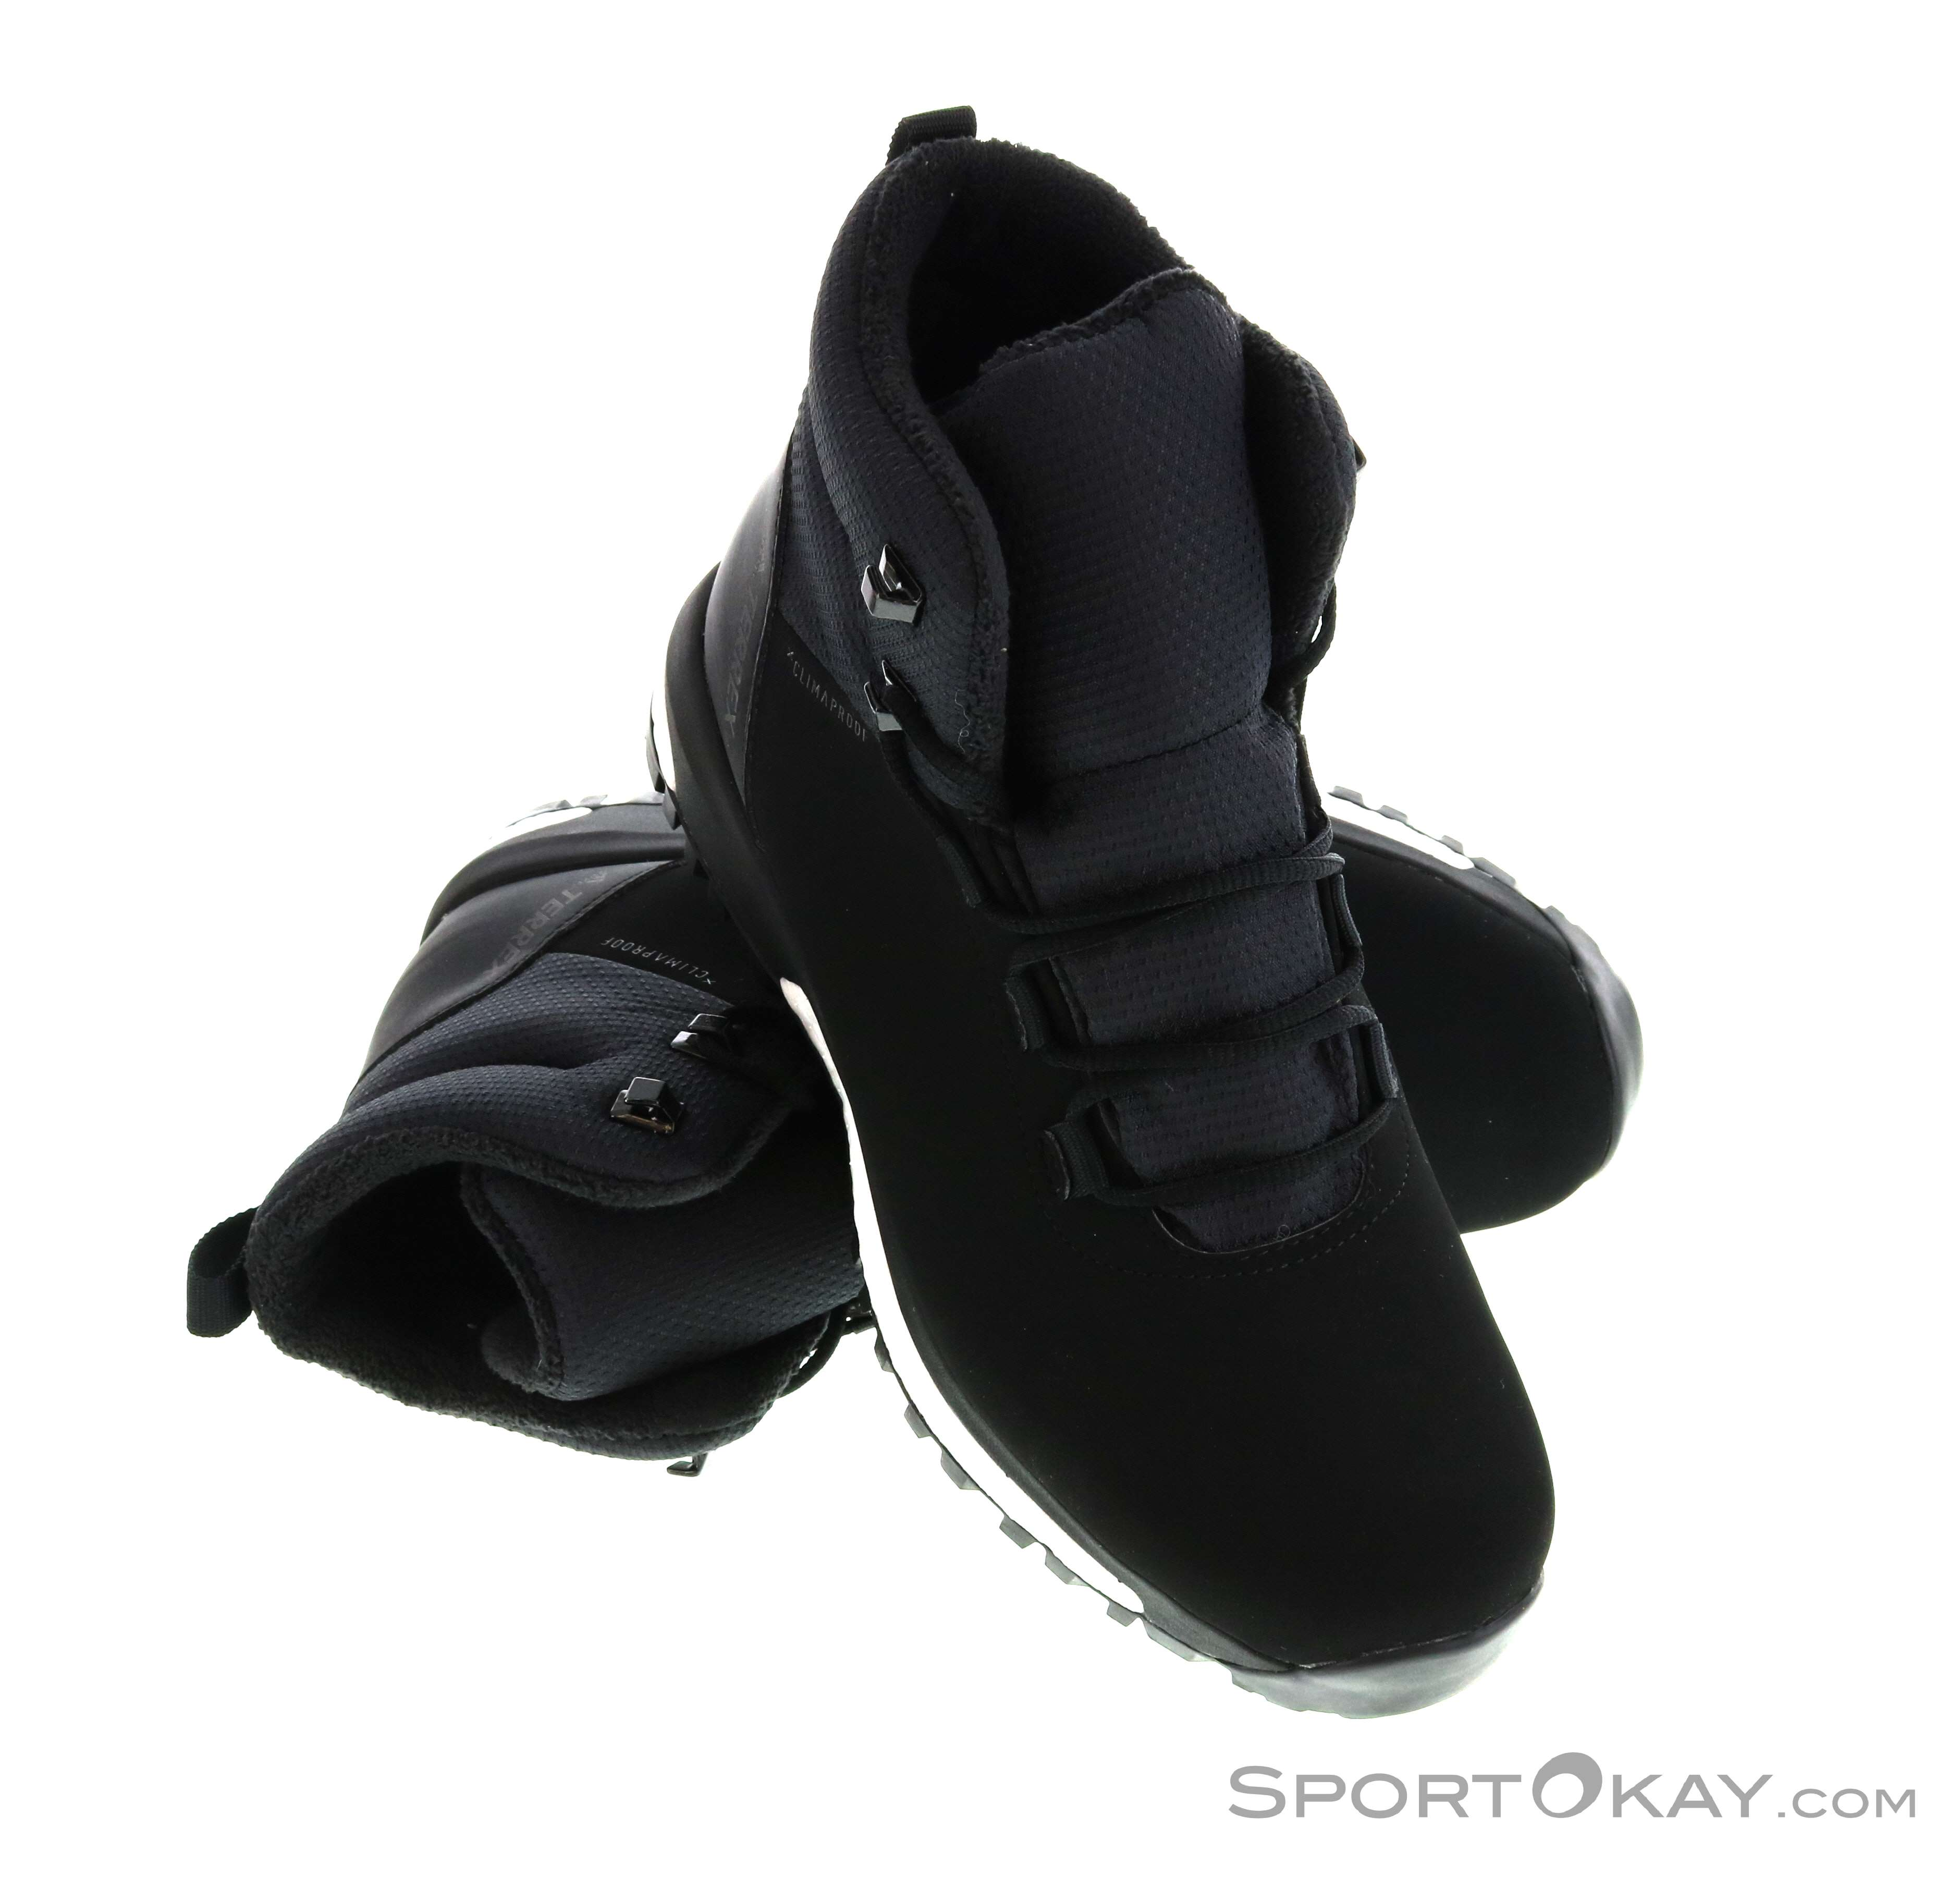 brand new 35d99 62b91 adidas Terrex Pathmaker CW Womens Hiking Boots, adidas, Black, , Female,  0002